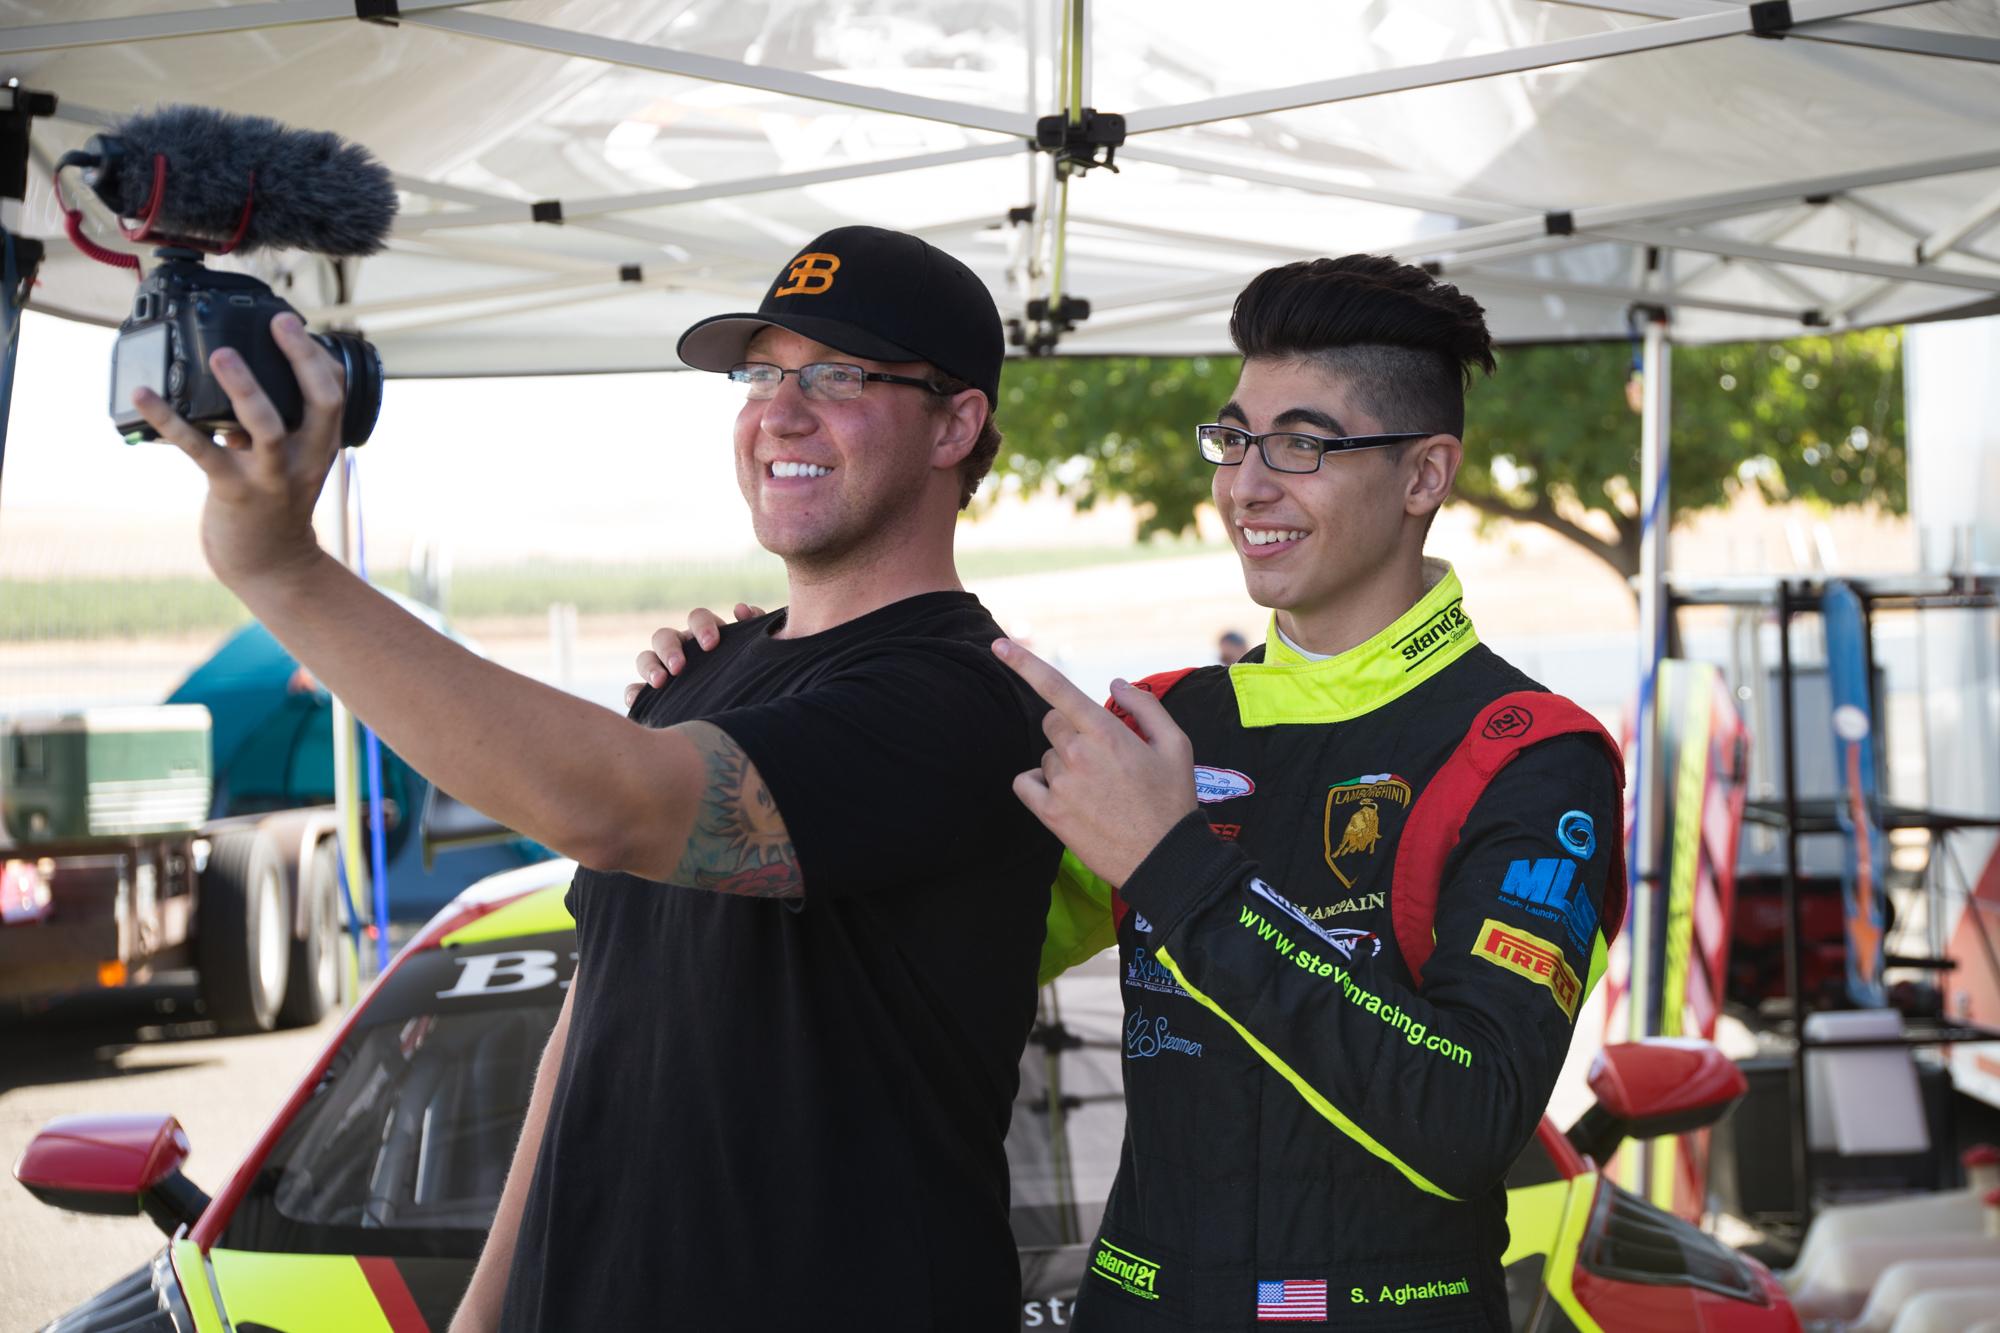 Steven-Racing-20171007-45250.jpg